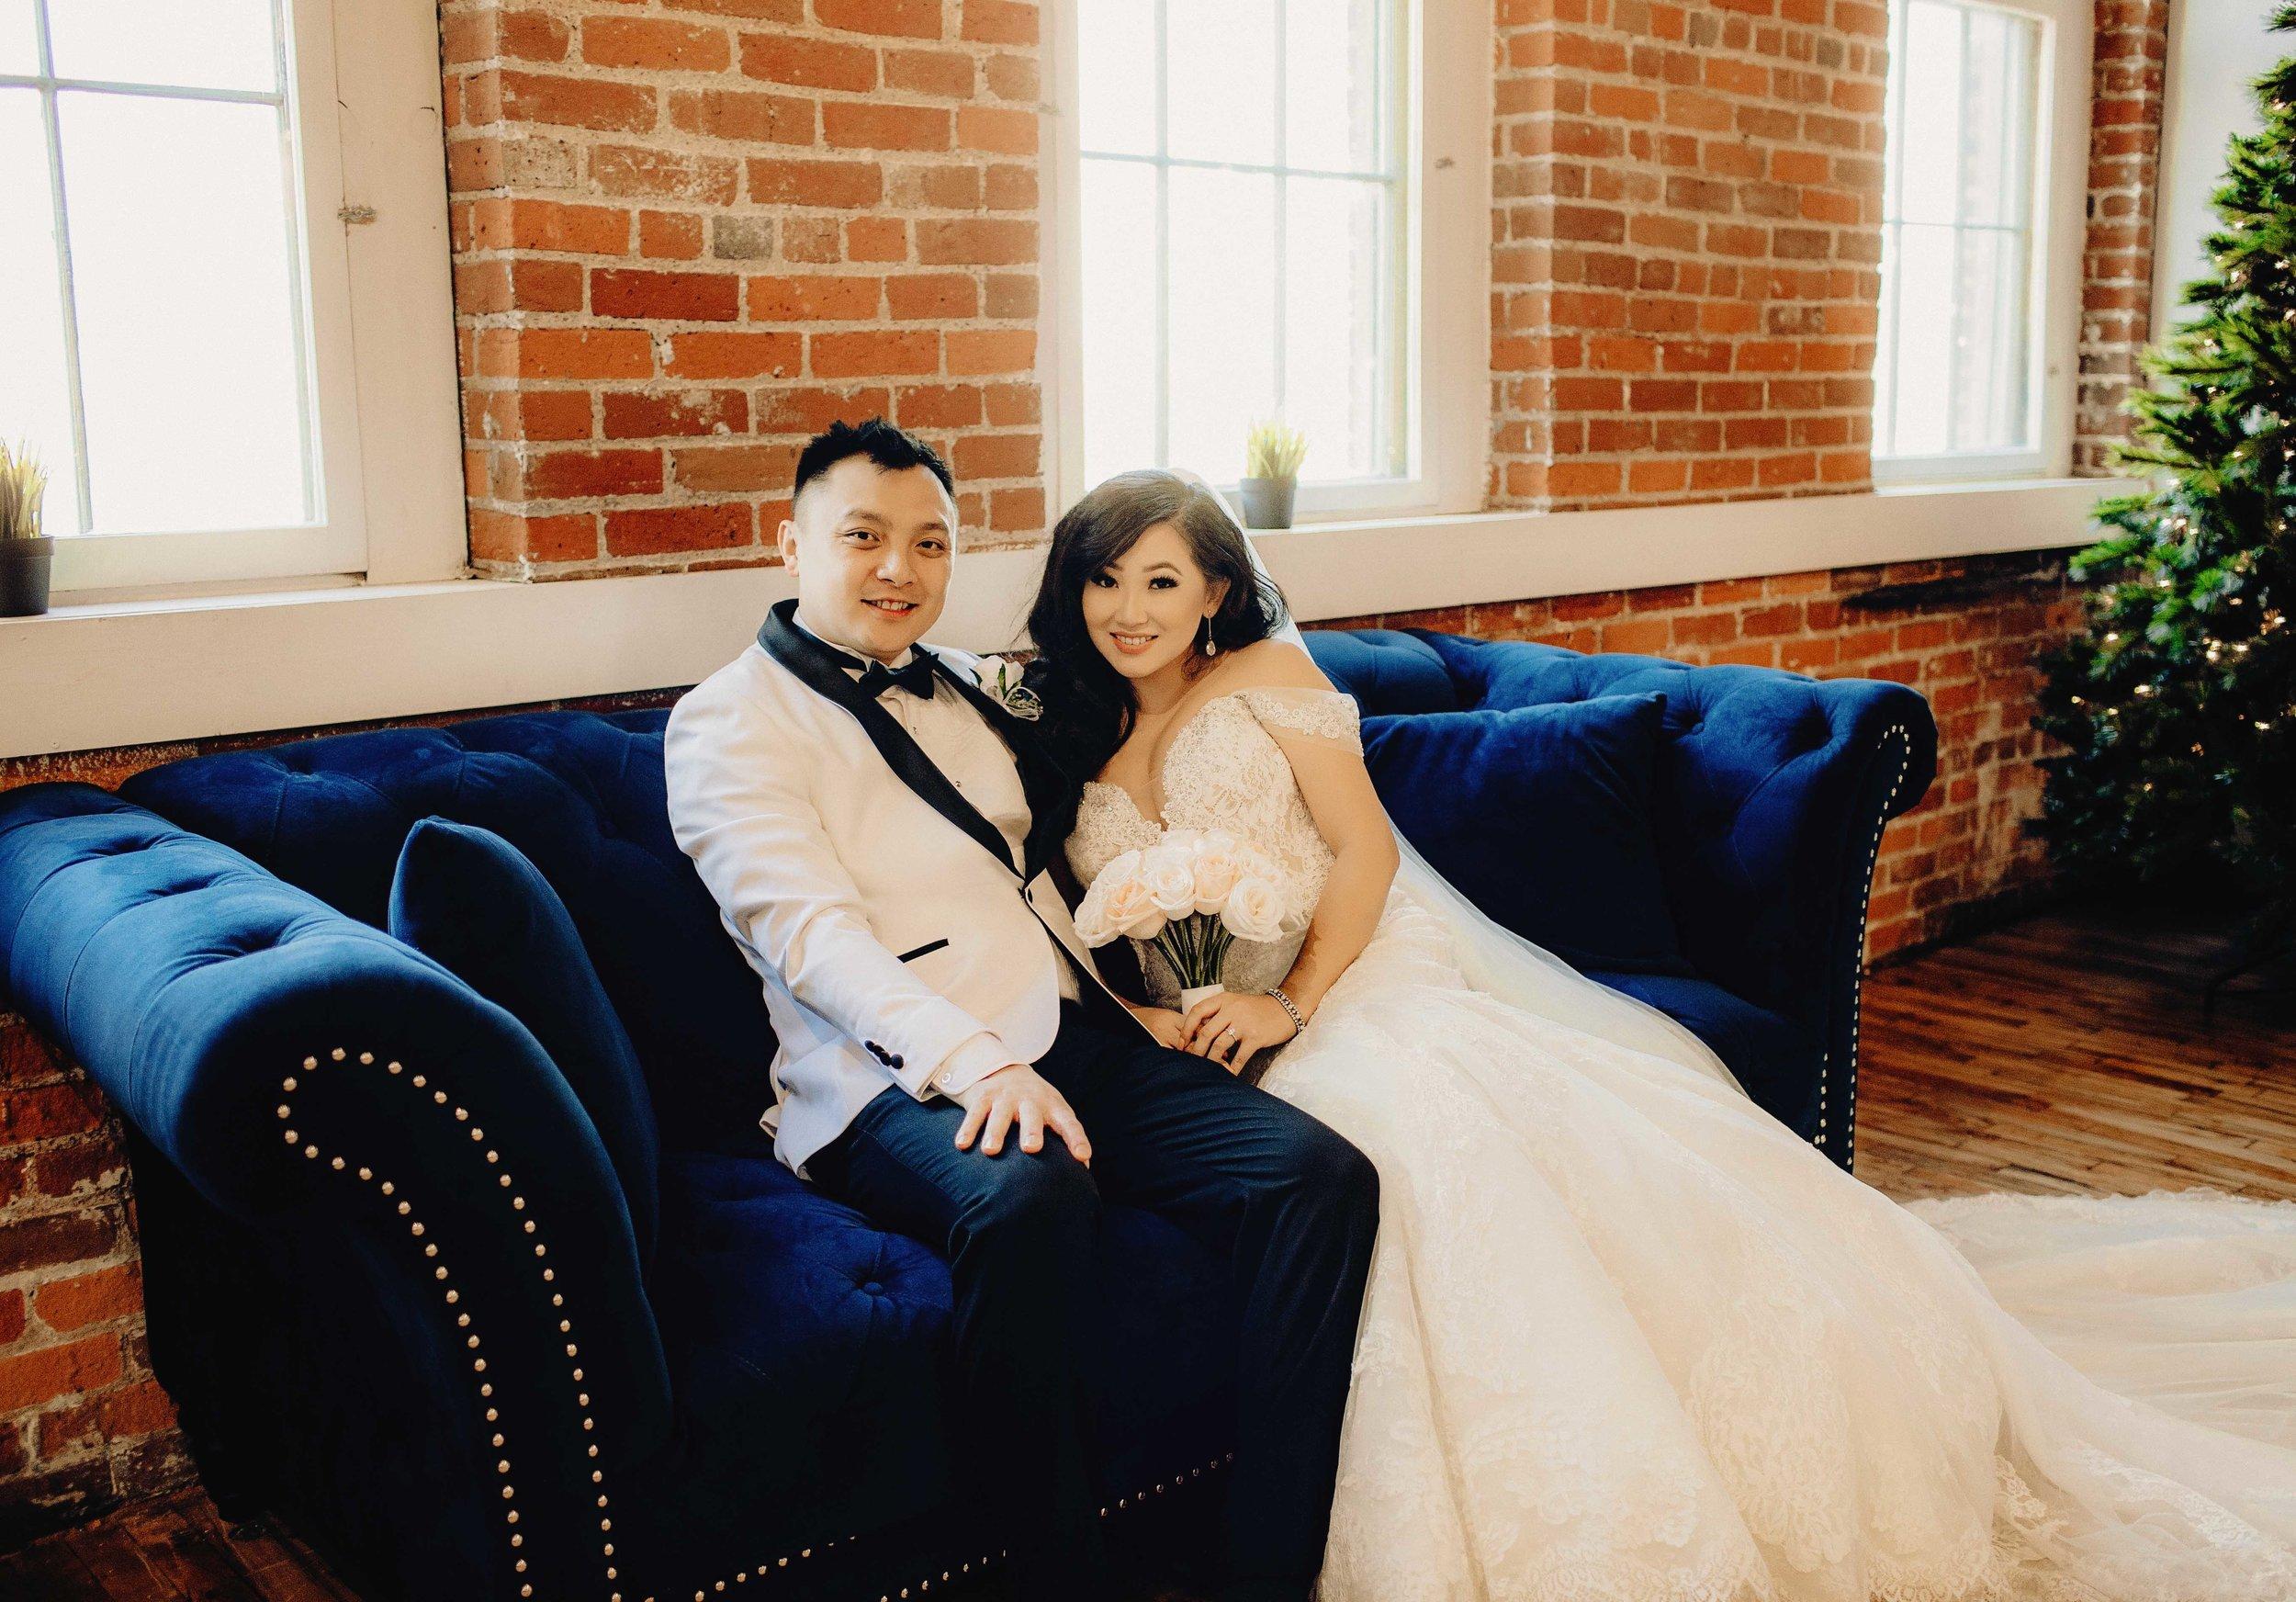 Honey + Yao, Part II, The Bride and Groom-31.jpg